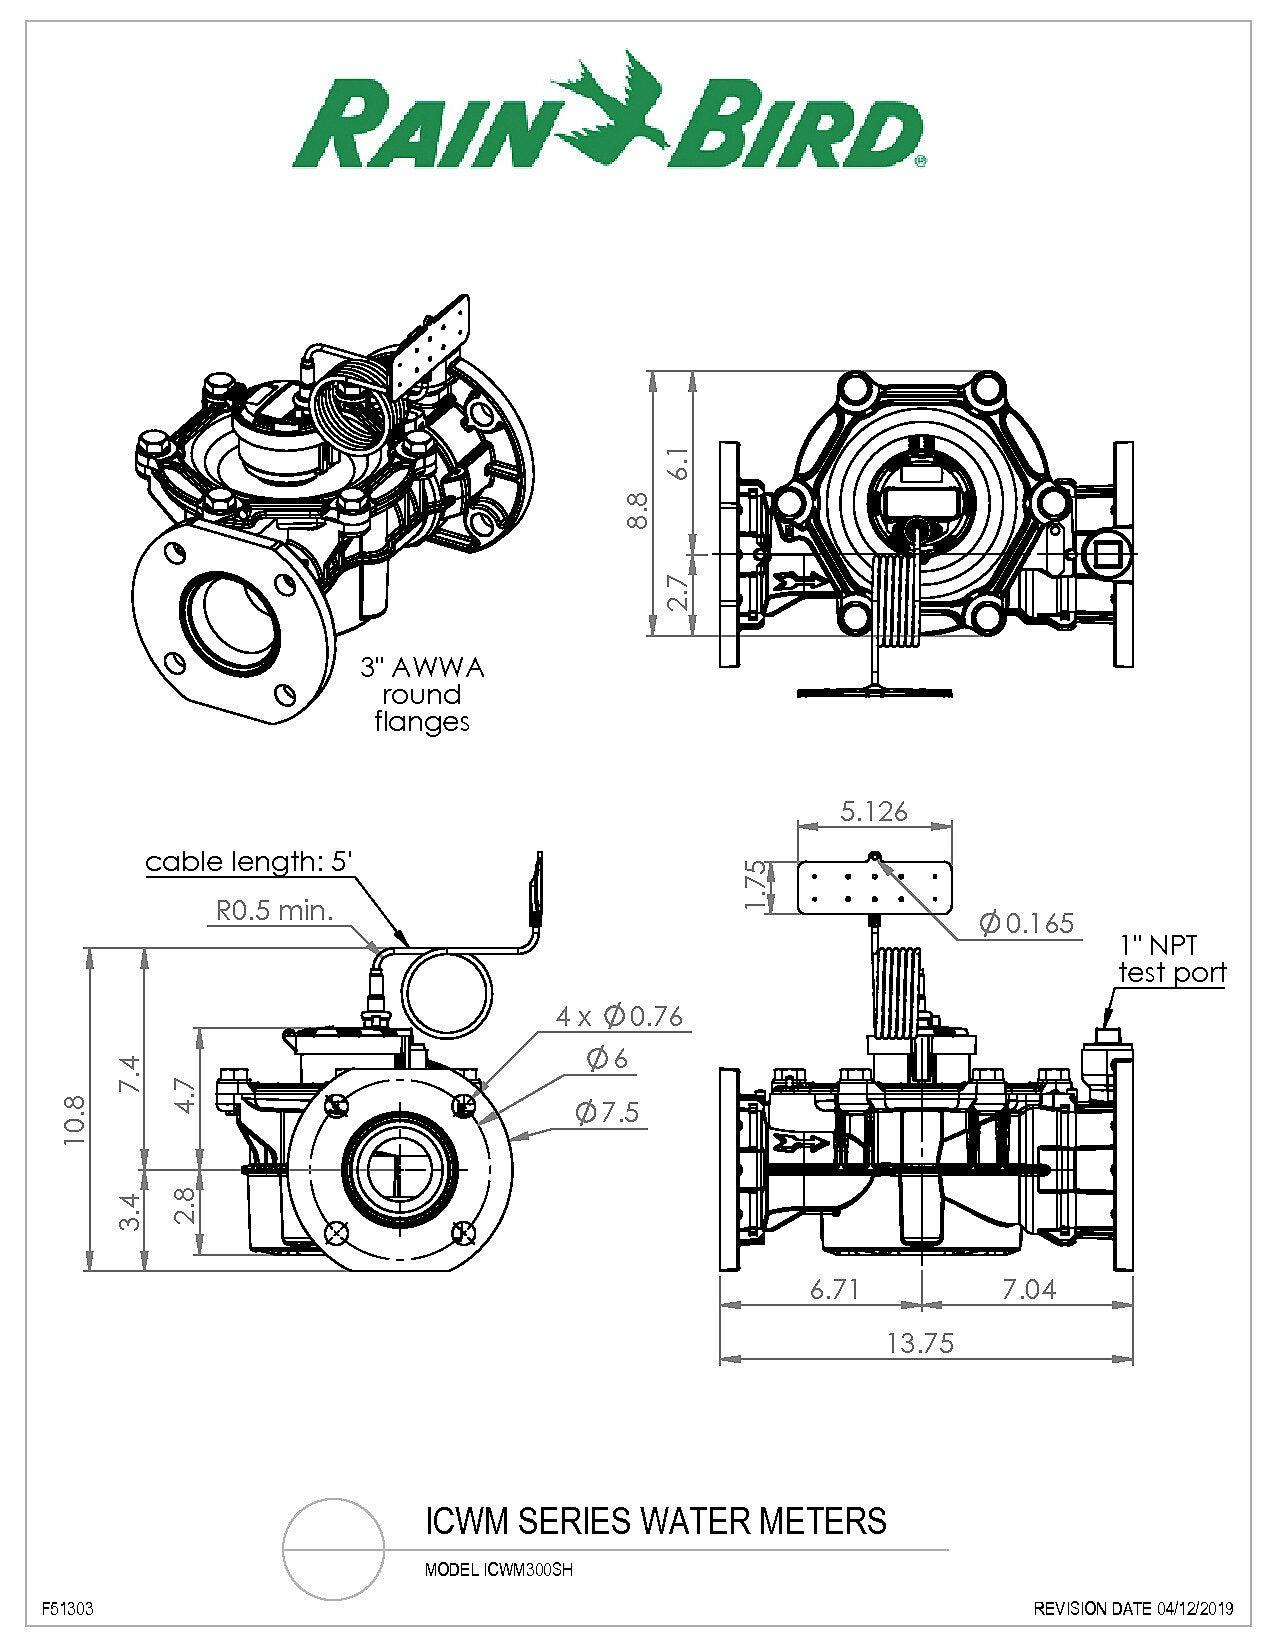 icwm300sh water meter drawing